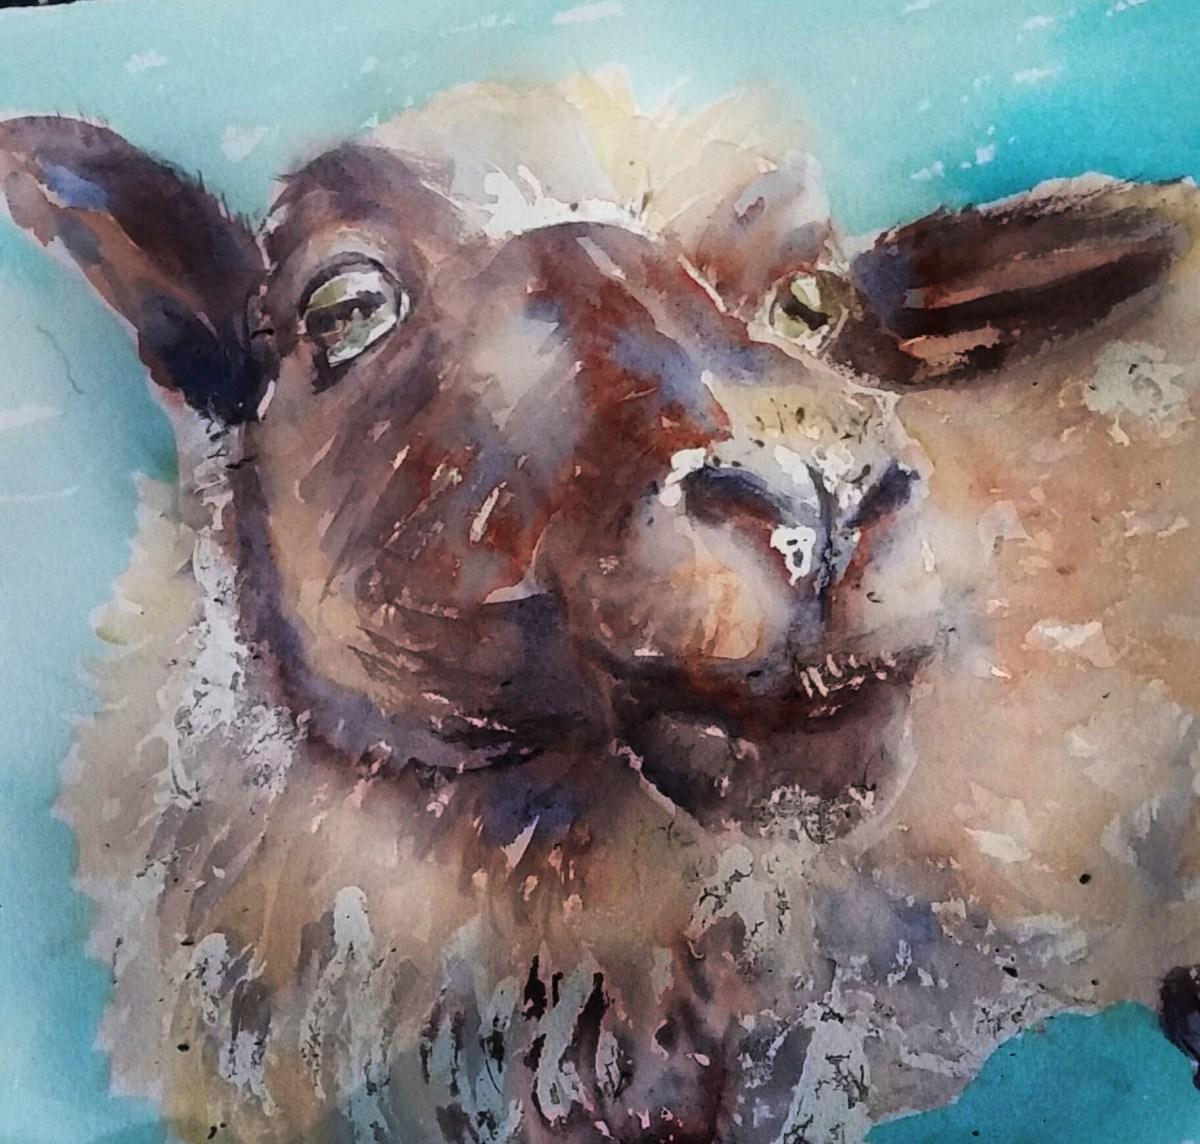 #WorldWatercolorGroup - Watercolor by Terhi Kalliola - Sheep - Doodlewash